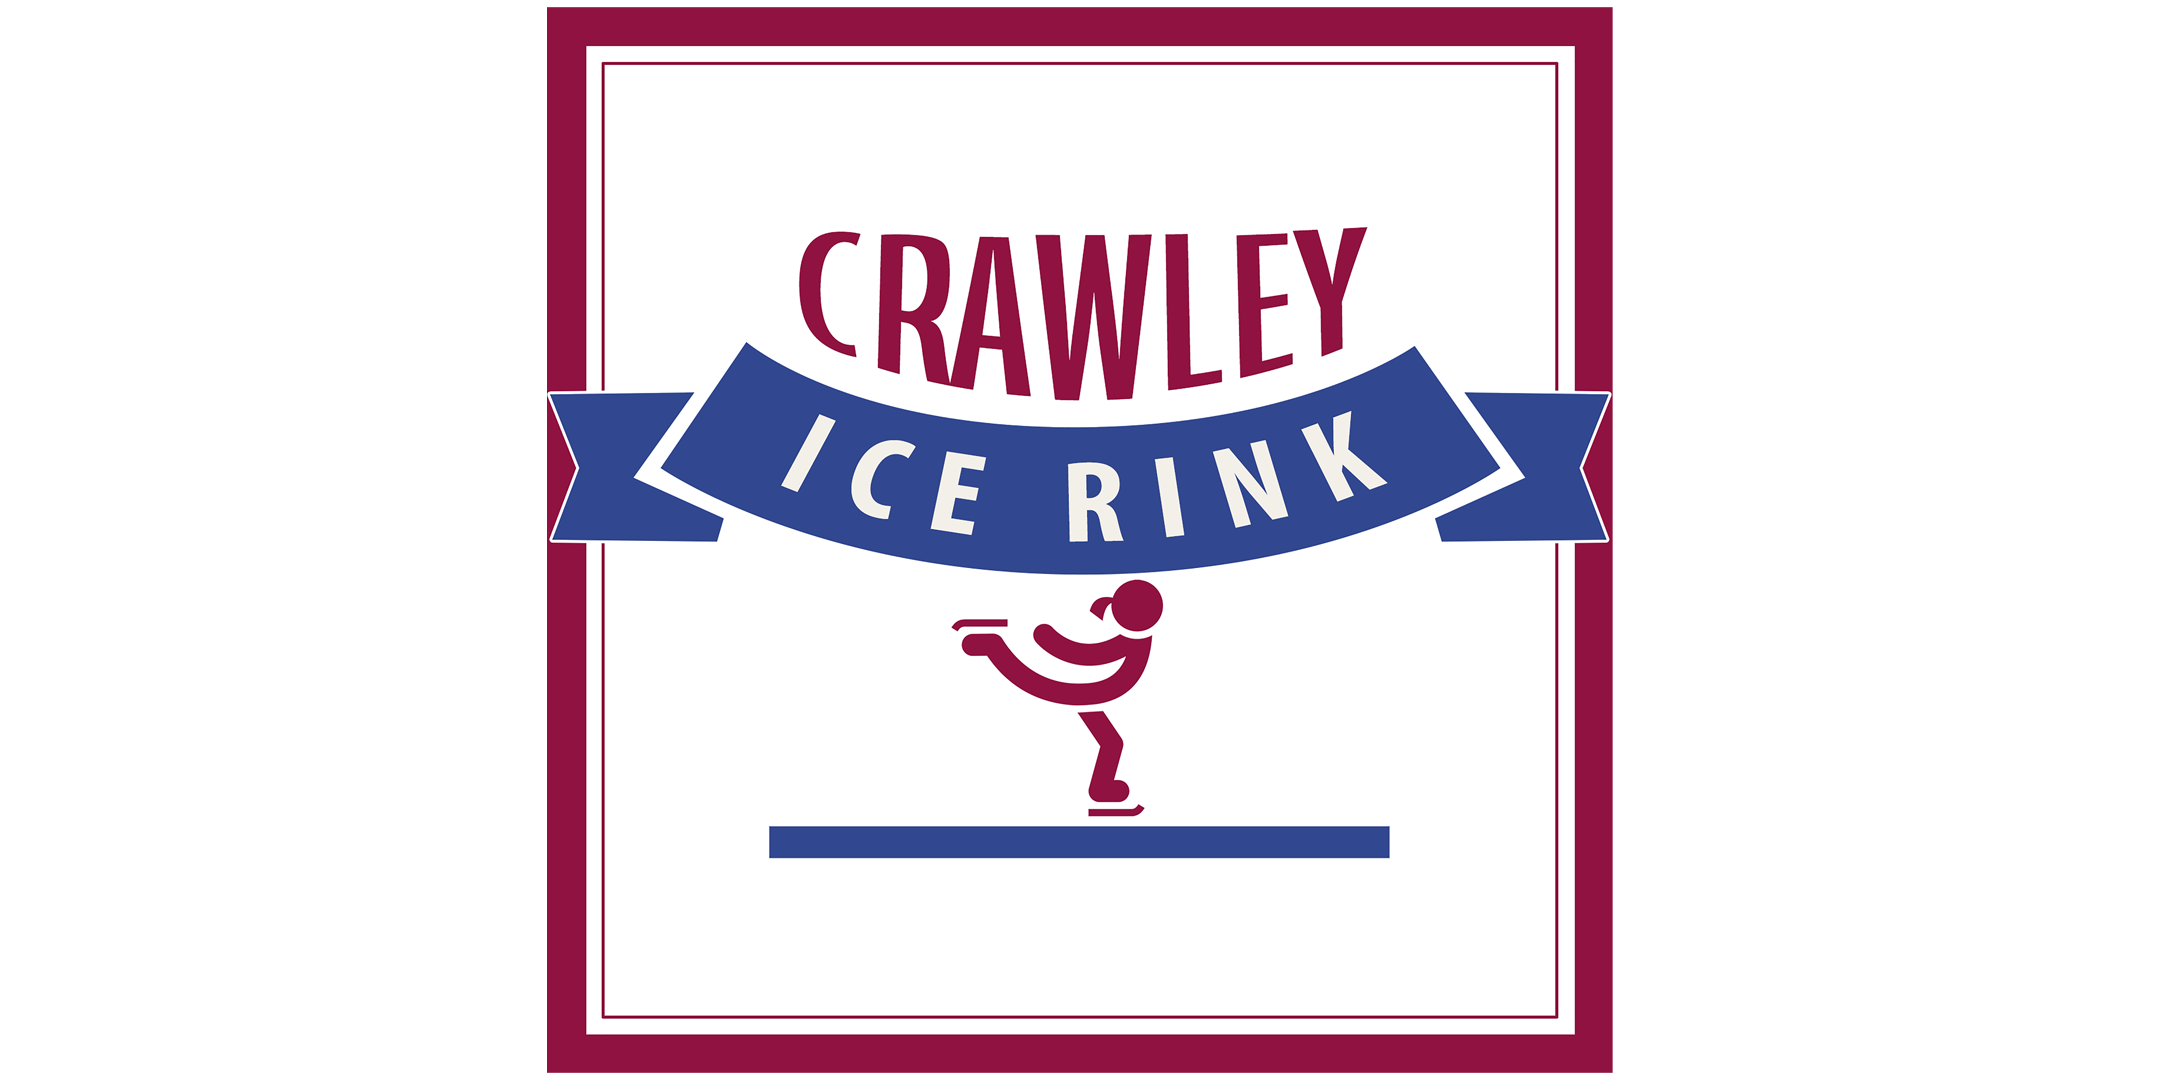 Crawley Ice Rink - 27th November (Off Peak)